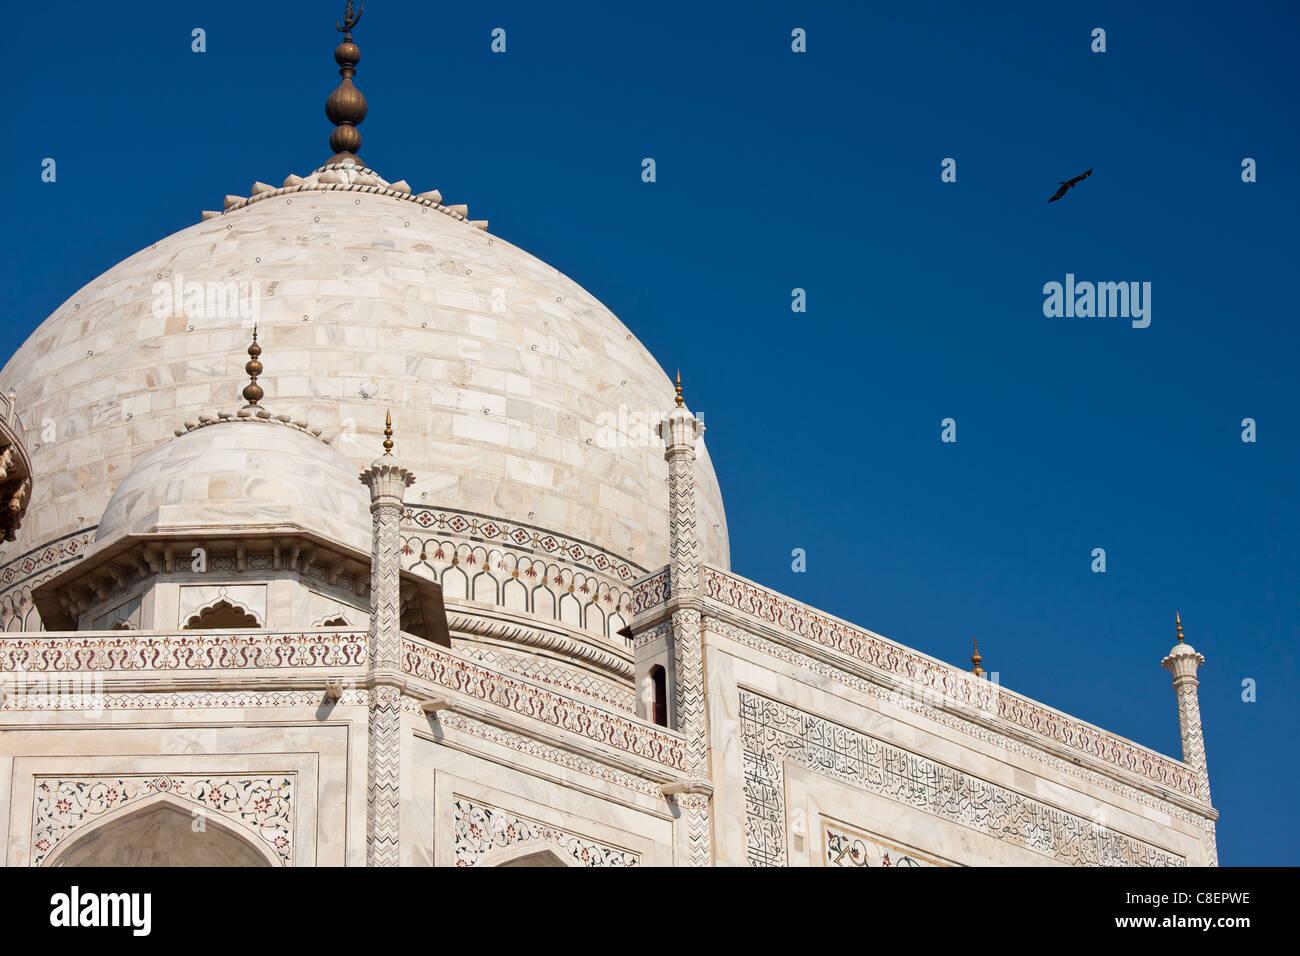 The Taj Mahal mausoleum with birds flying around the dome, southern view detail, Uttar Pradesh, India - Stock Image